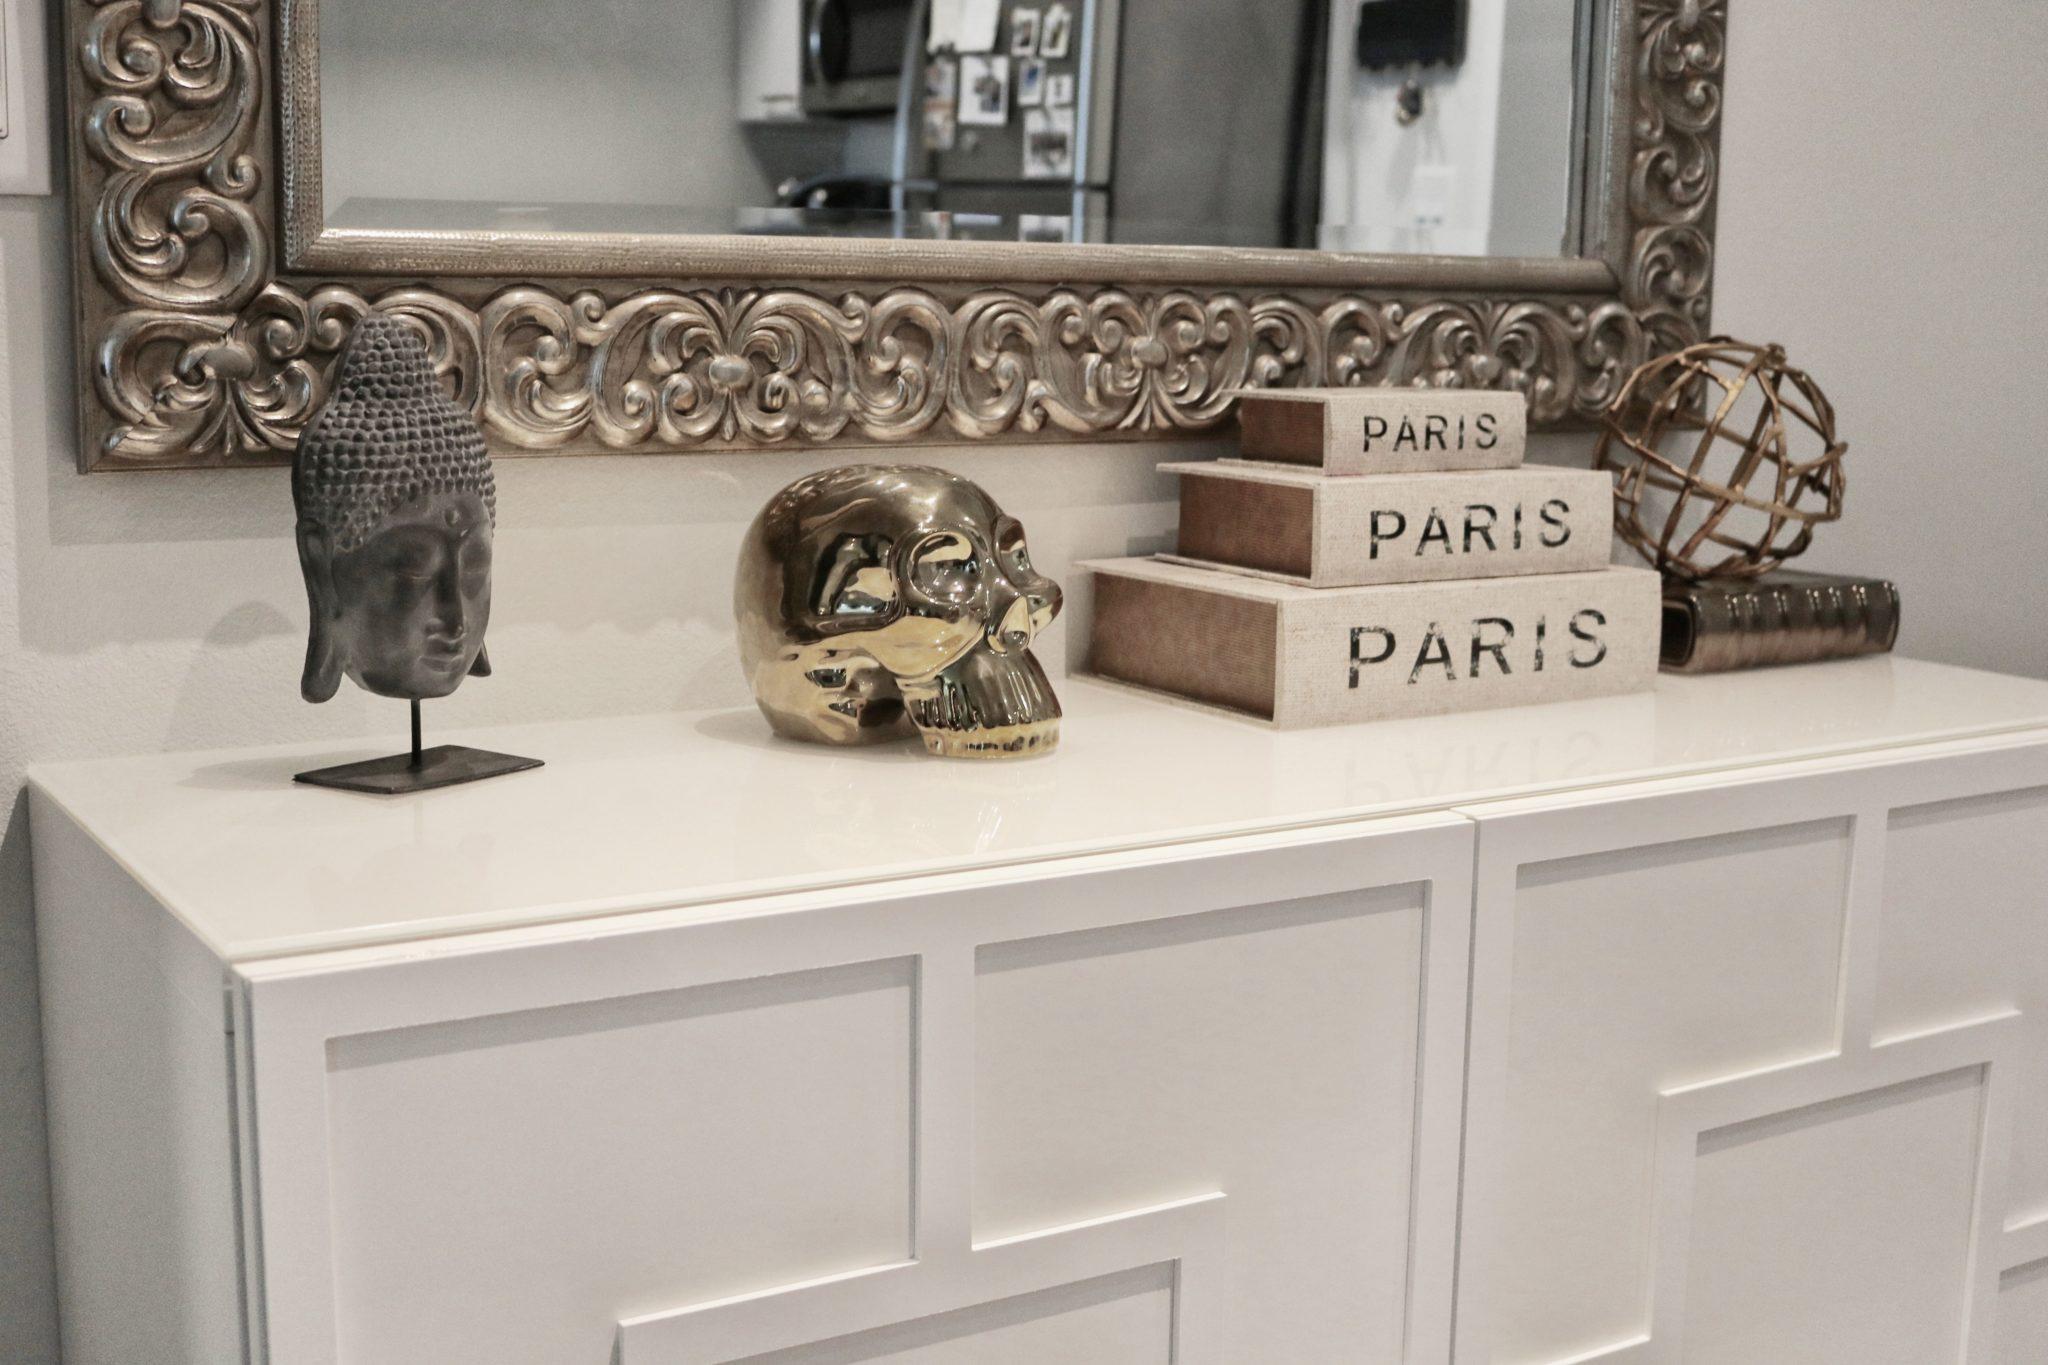 ikea furniture diy. DIY: How To Make Ikea Furniture Look Fancy Diy E